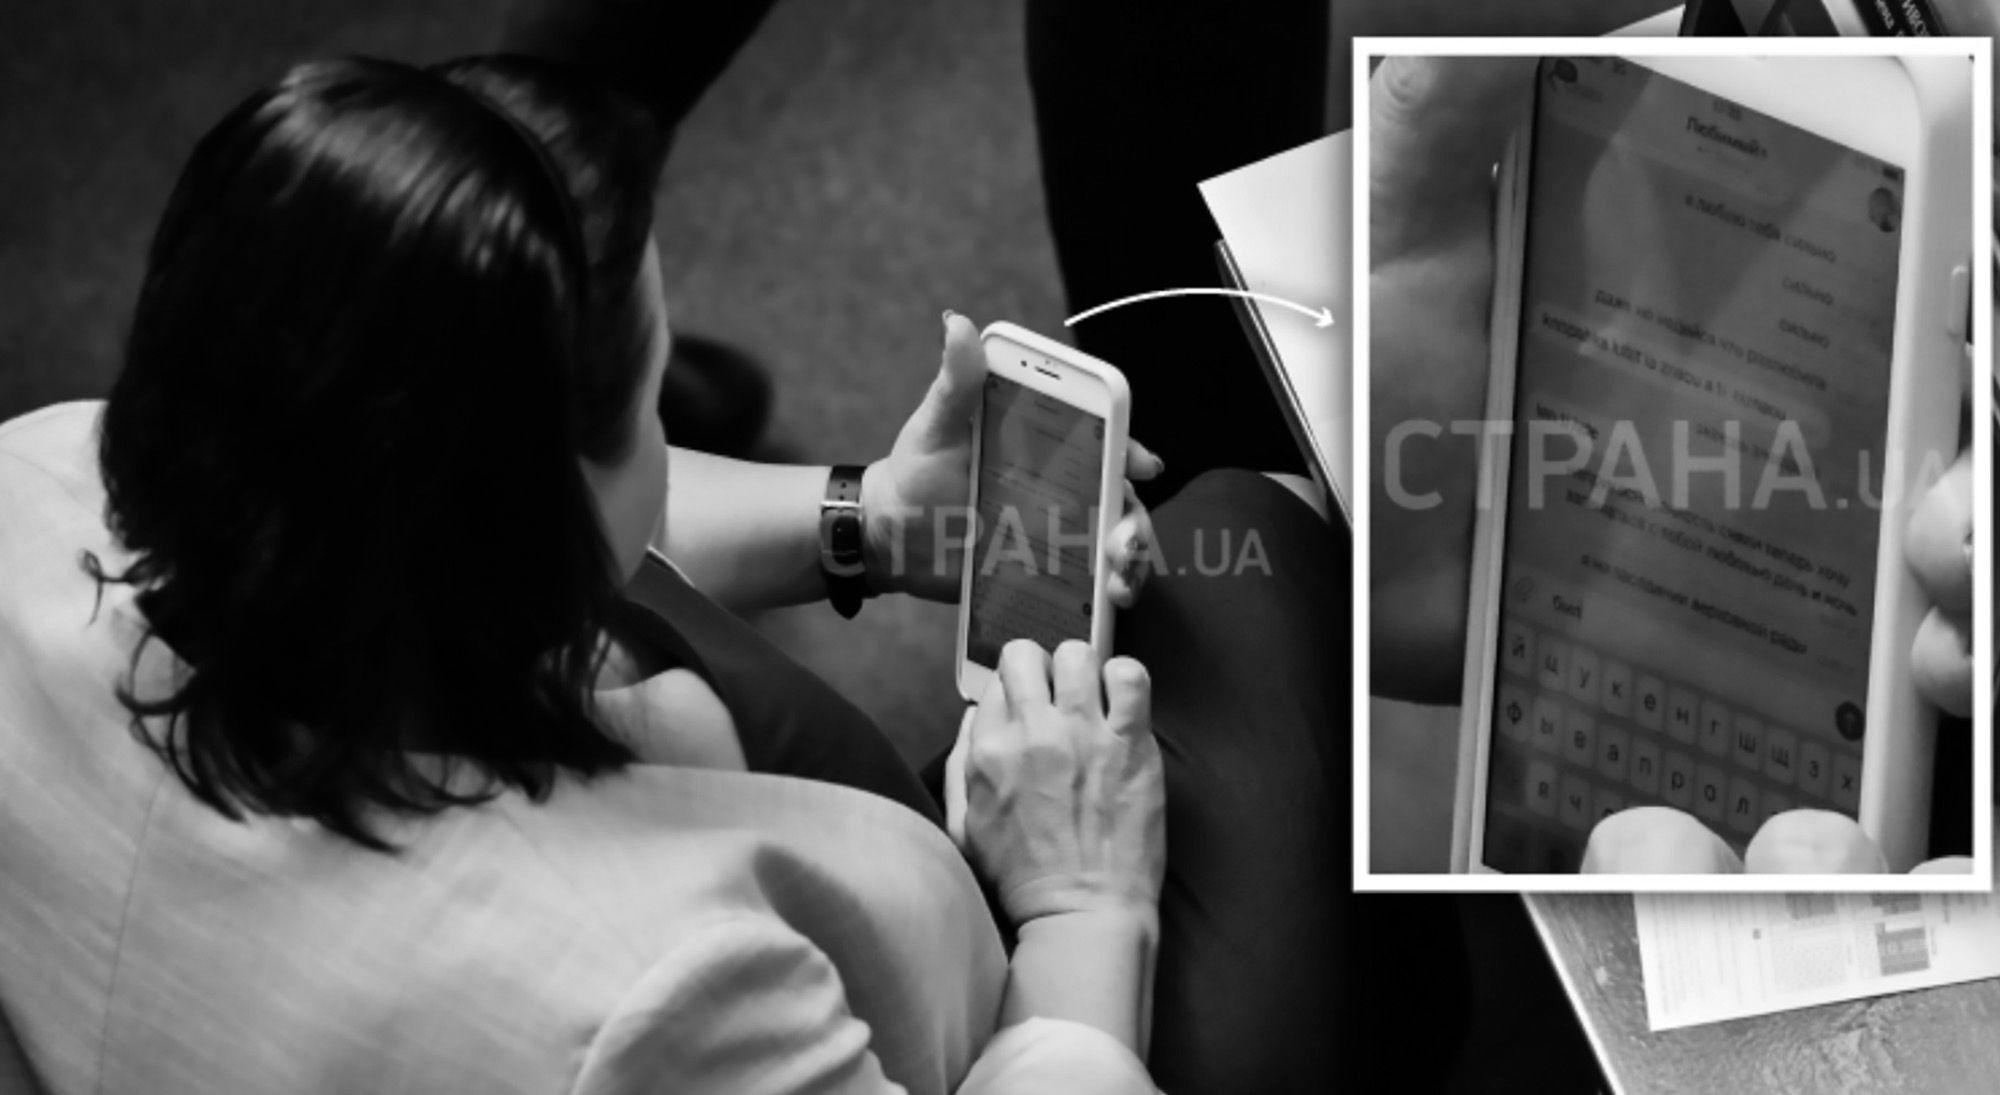 47yo Female MP Caught Sexting In Parliament